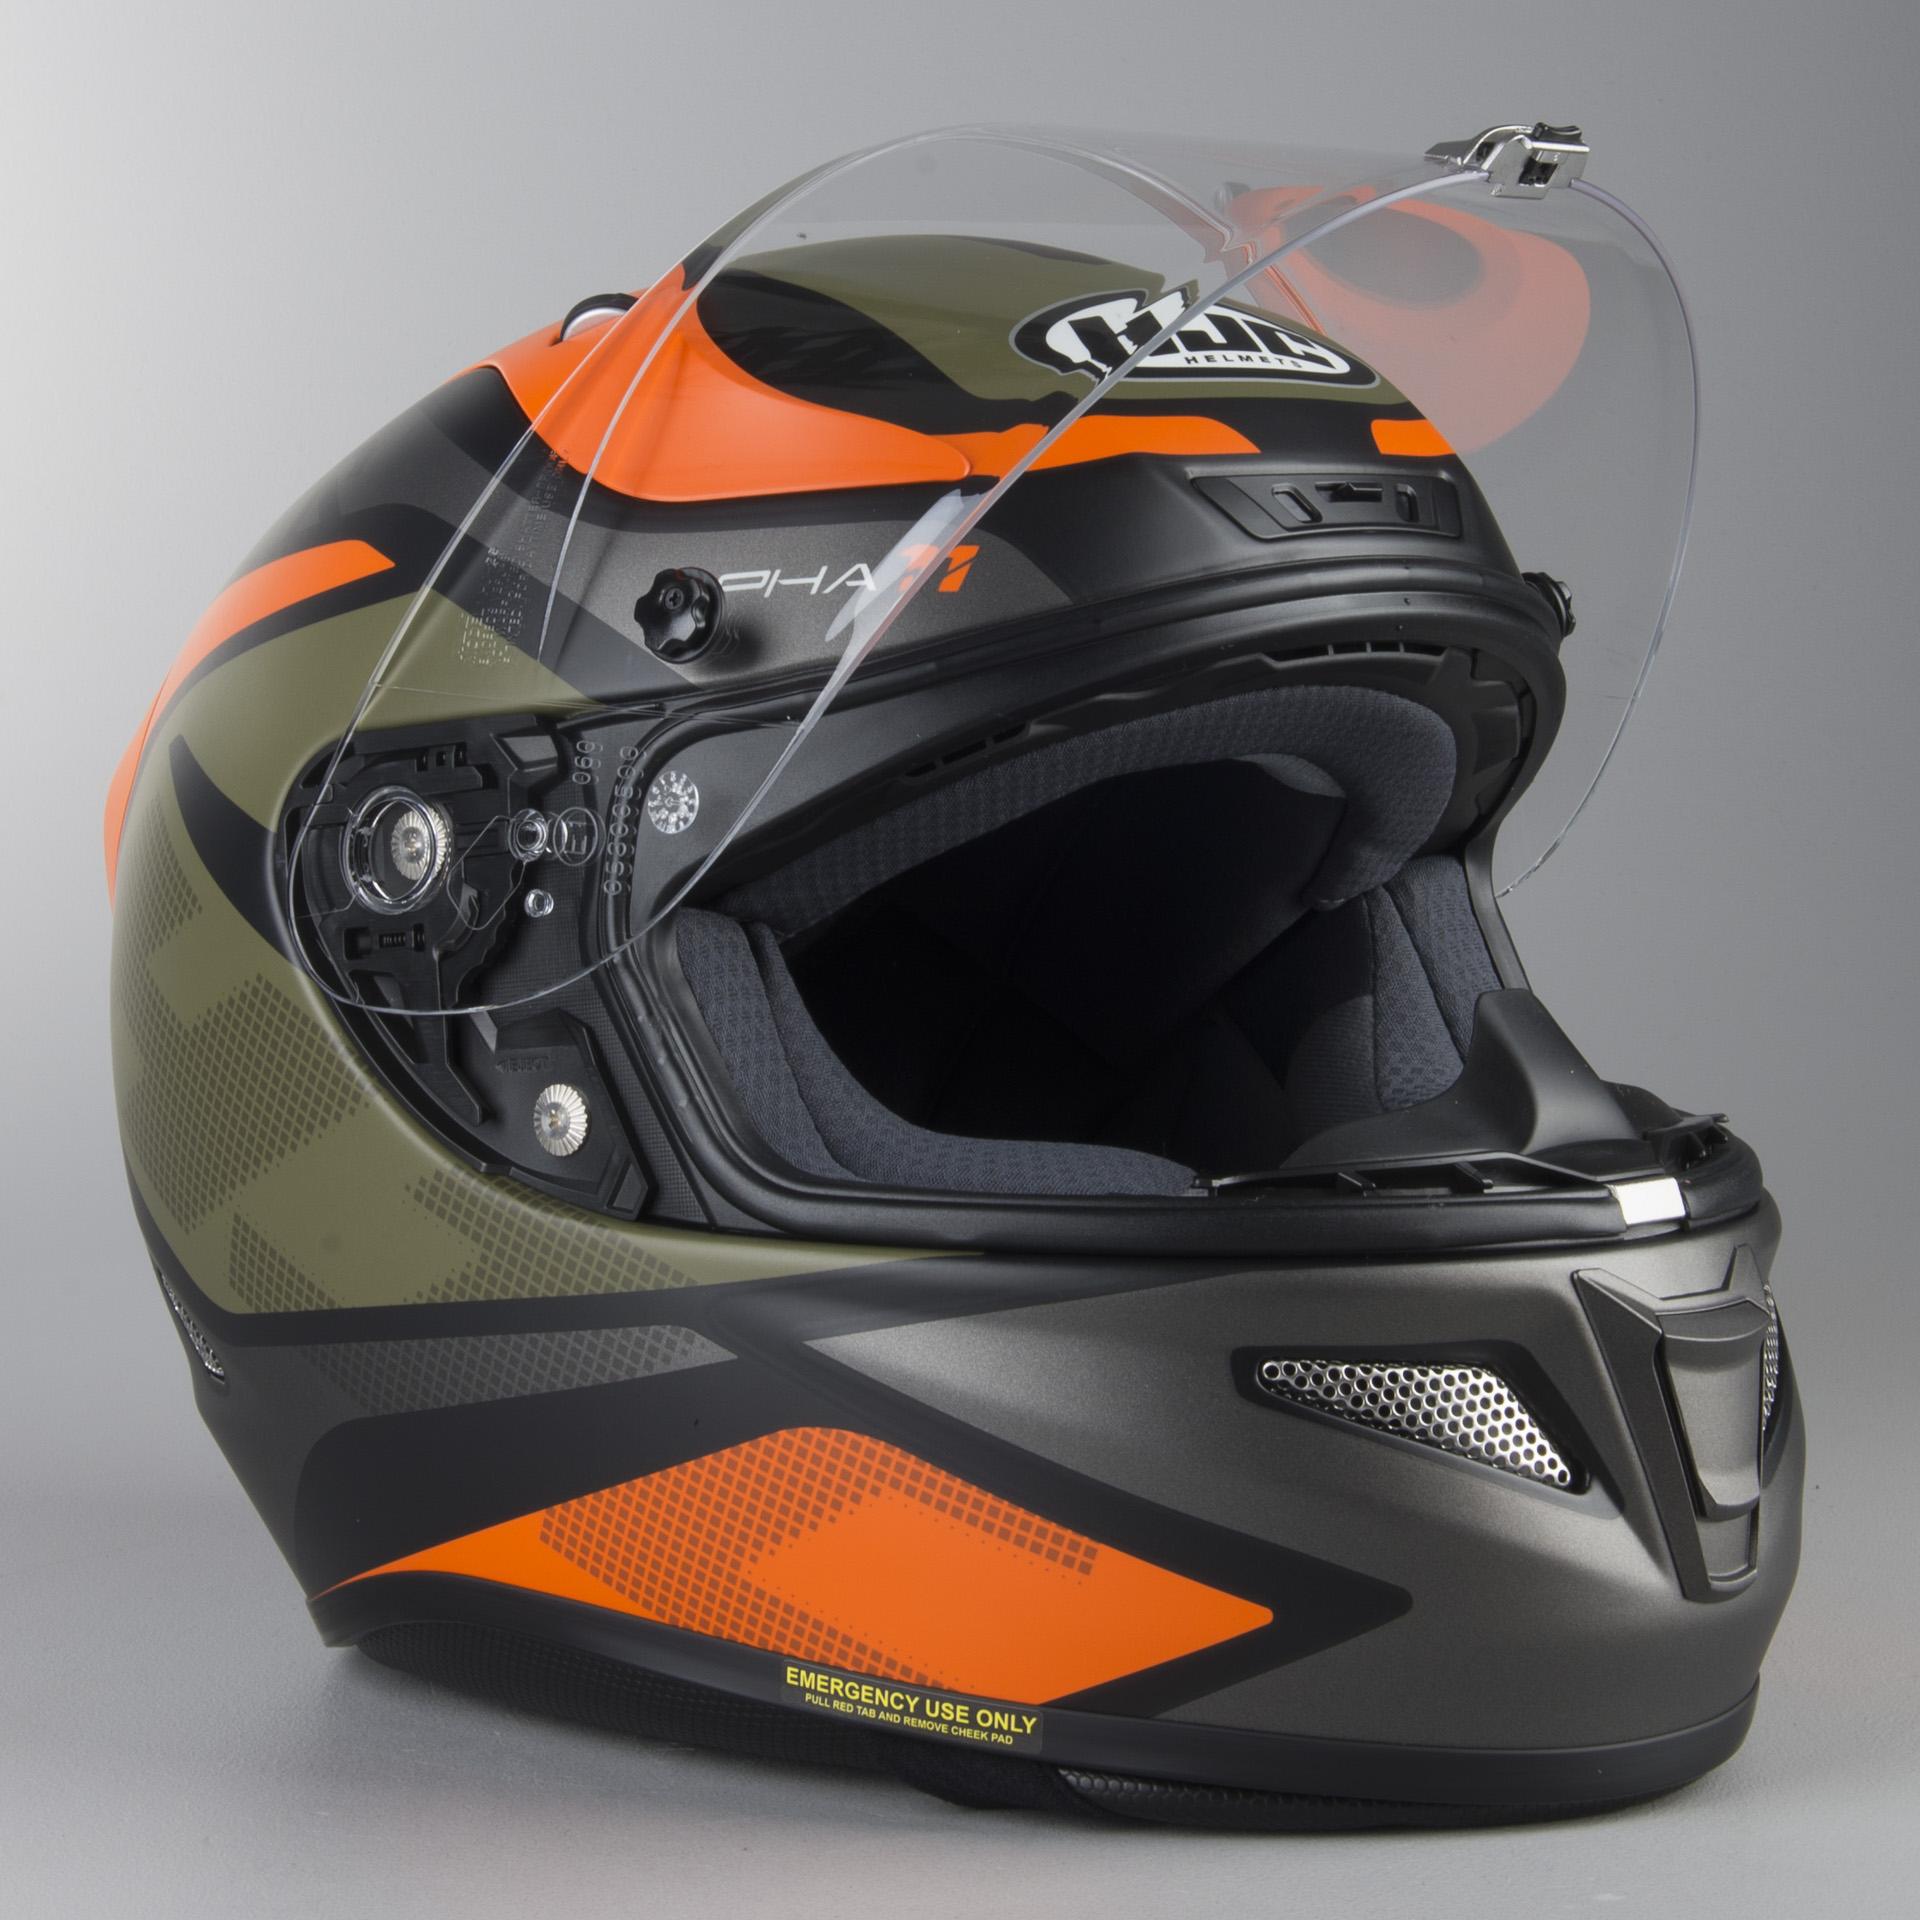 ACE OF SPADES Motorbike Helmet Sticker Car Decal 100mm x 120mm Black